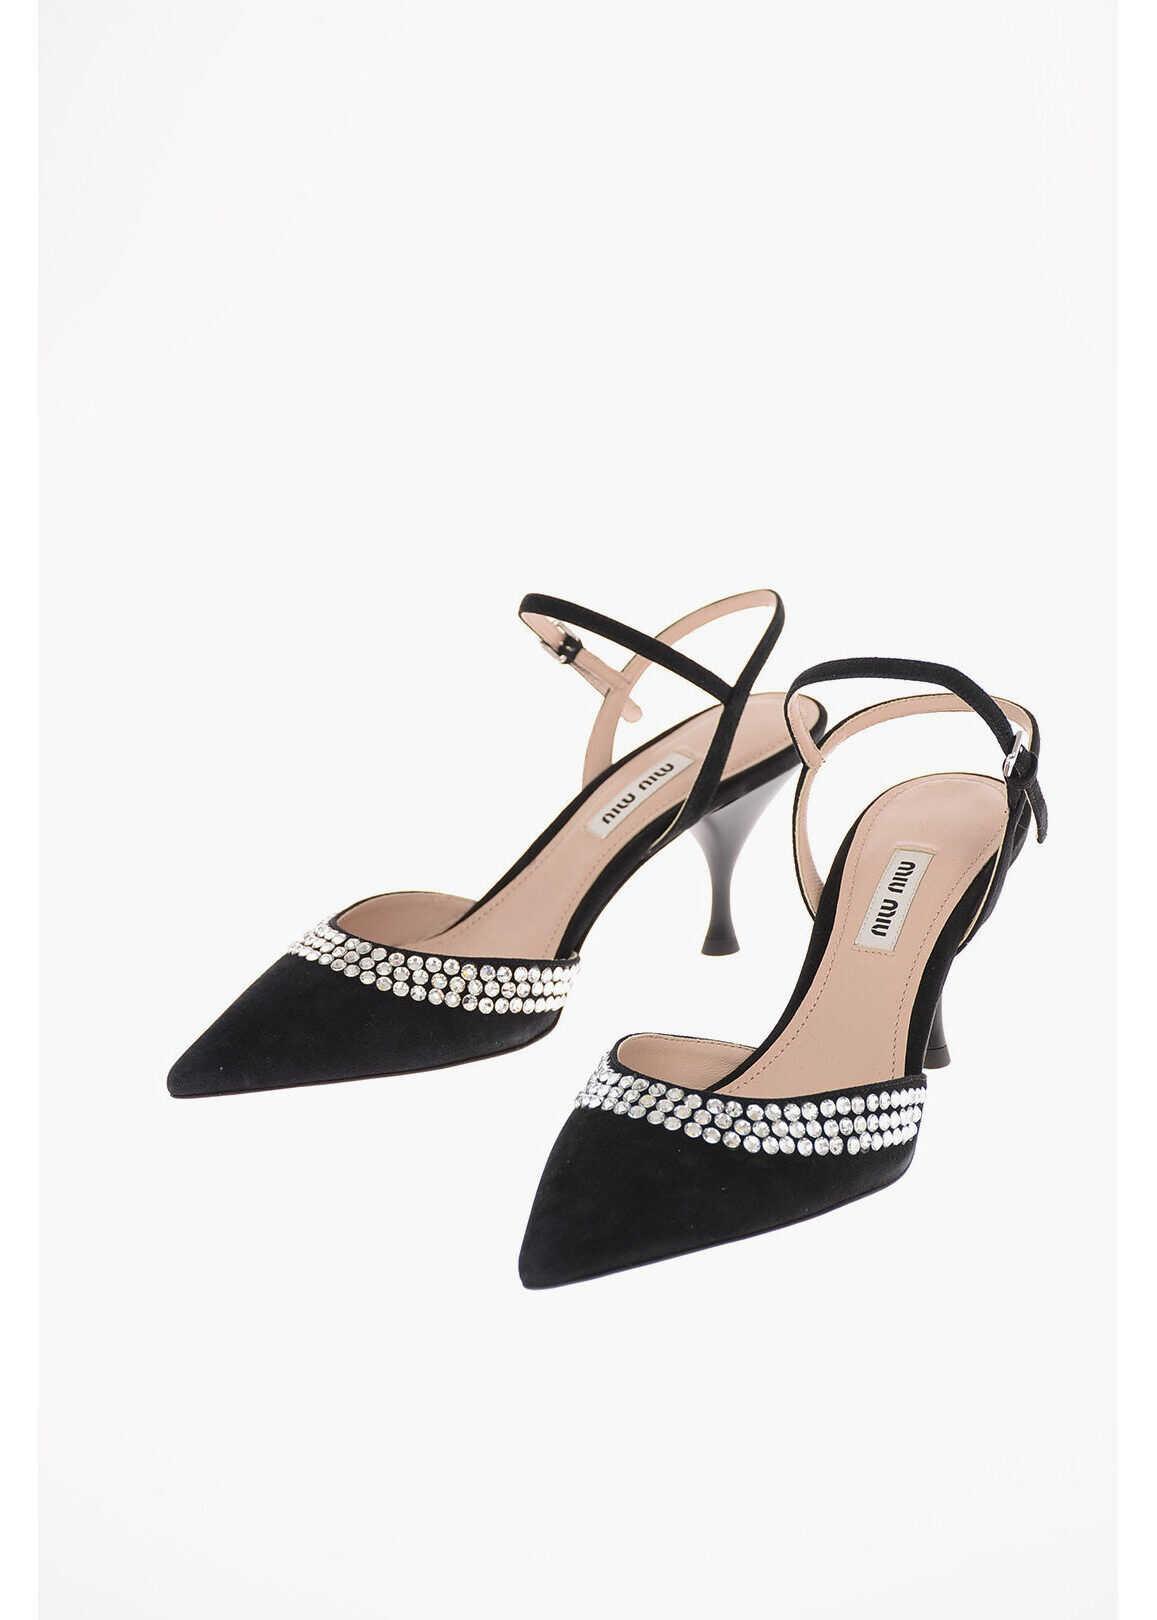 Miu Miu Suede Ankle Strap Pumps with Jewel Applications 8 cm BLACK imagine b-mall.ro